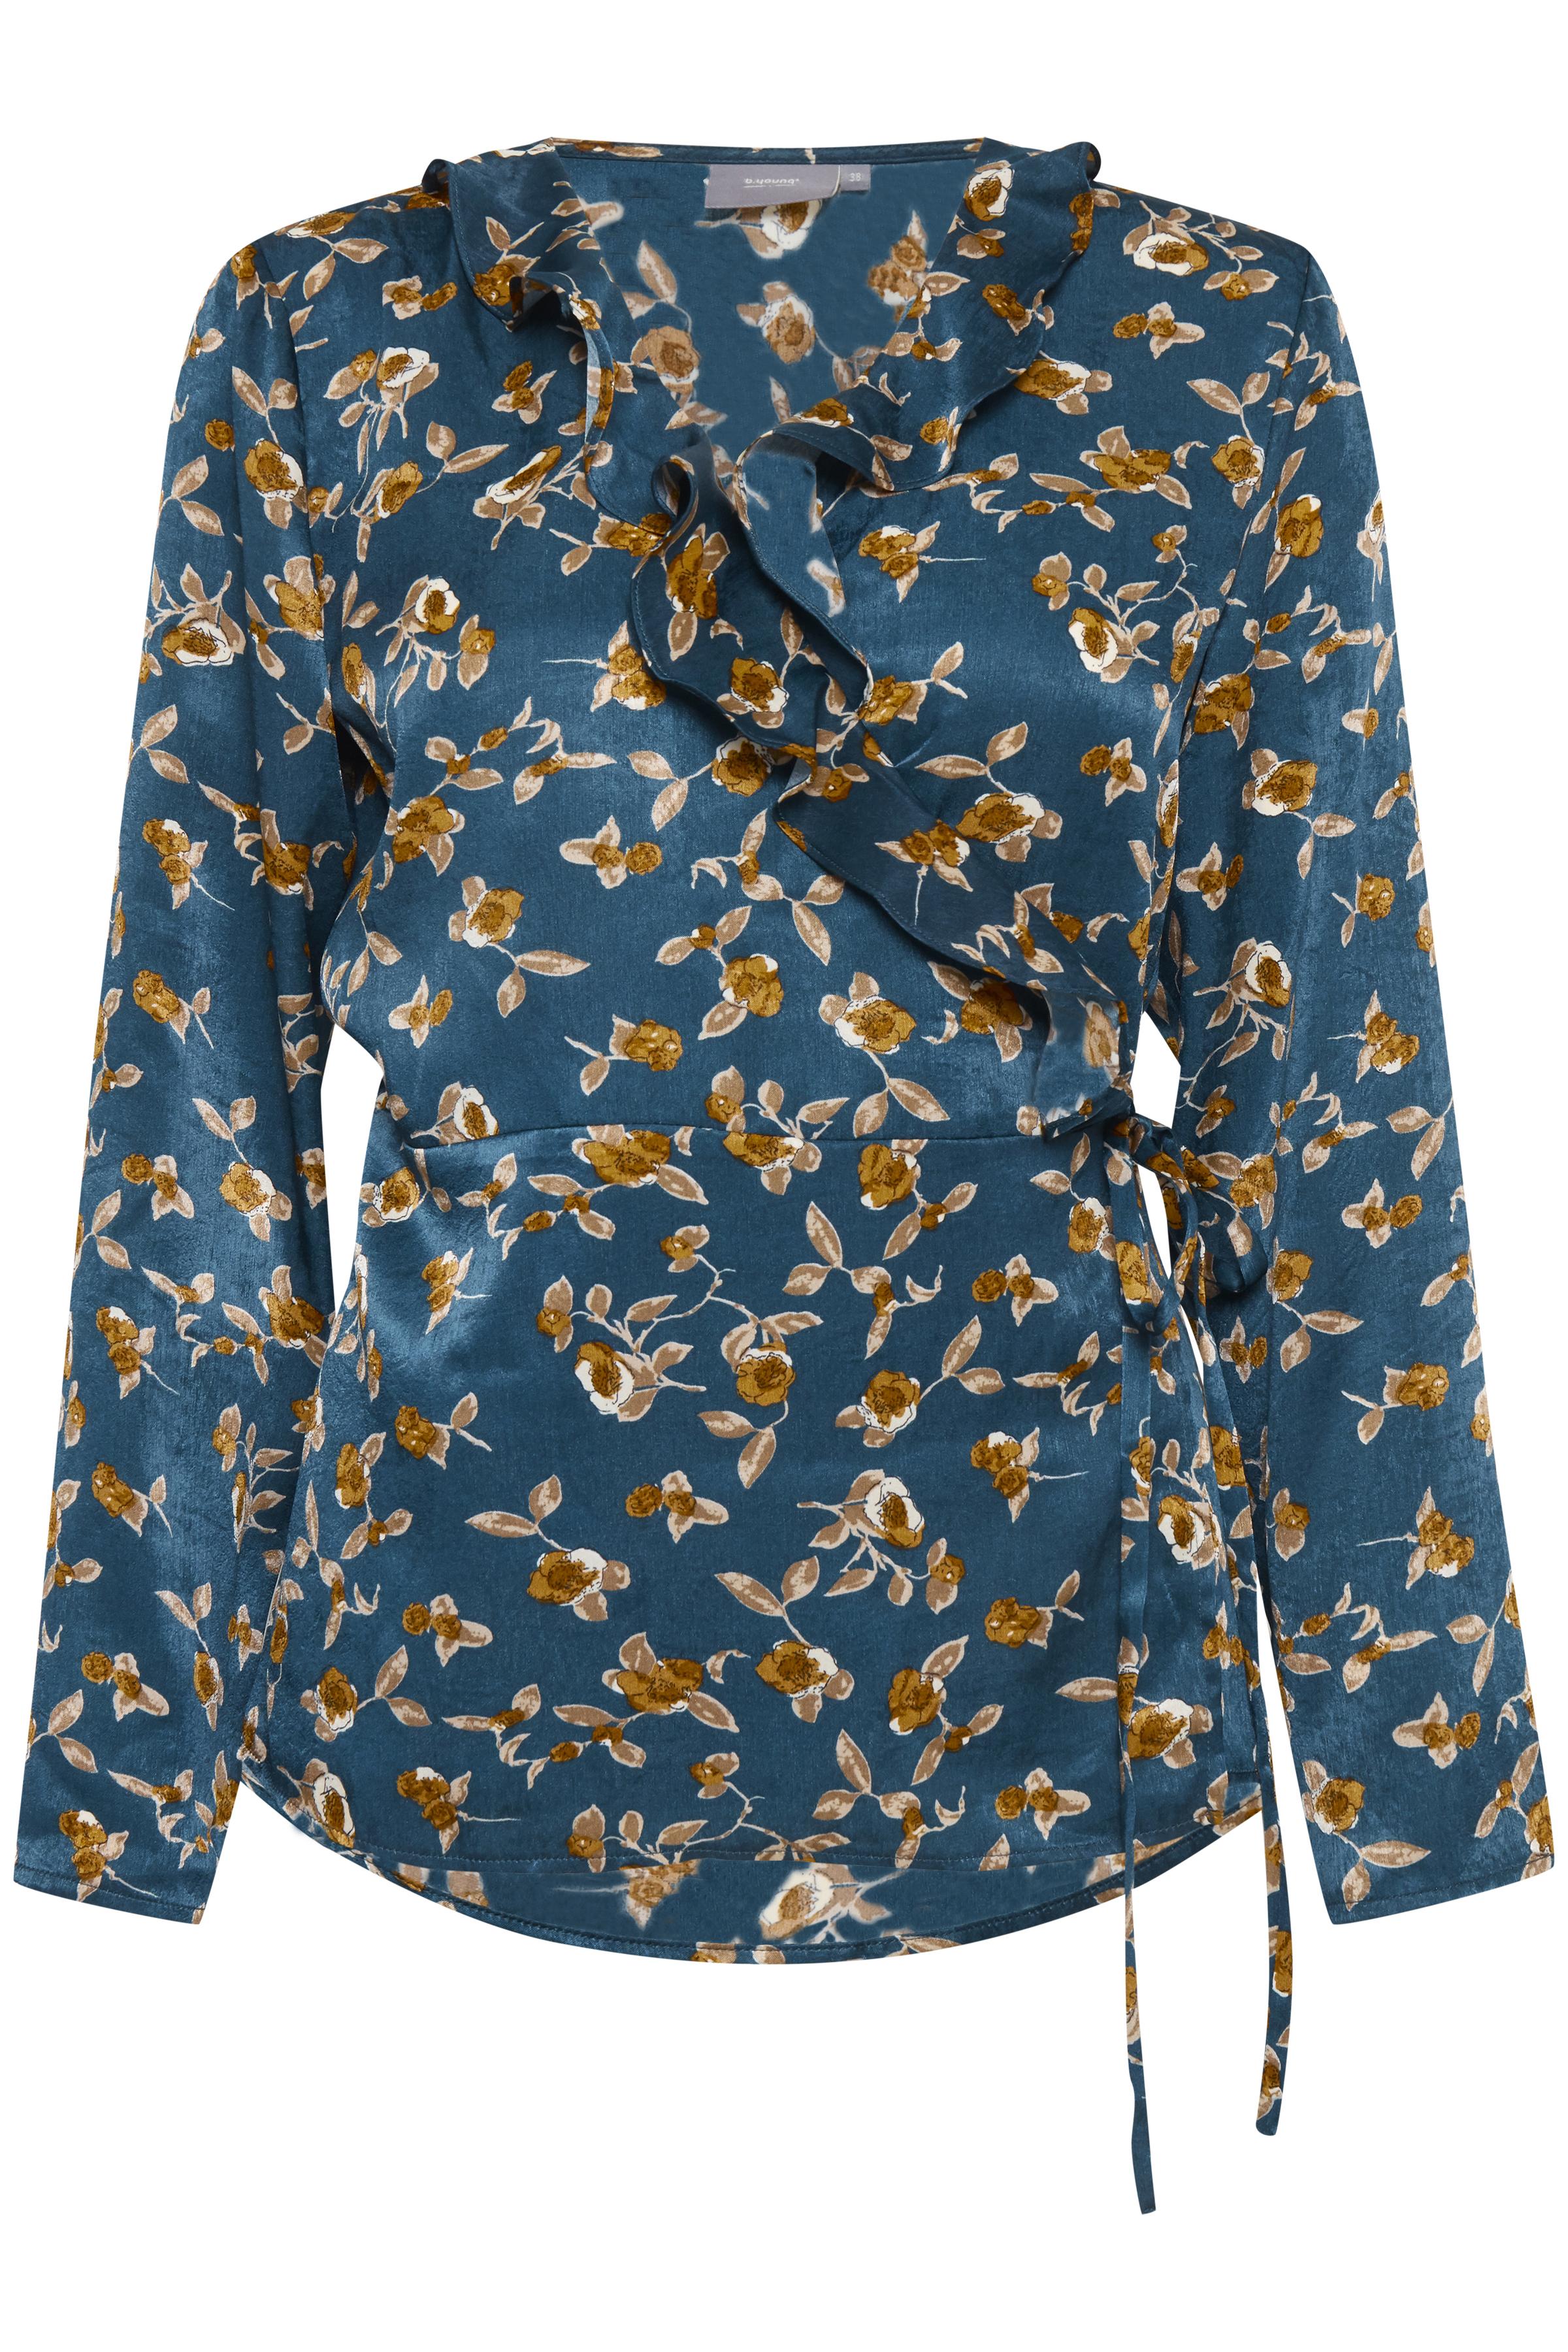 Majestic green combi 1 Langarm-Bluse von b.young – Kaufen Sie Majestic green combi 1 Langarm-Bluse aus Größe 34-42 hier